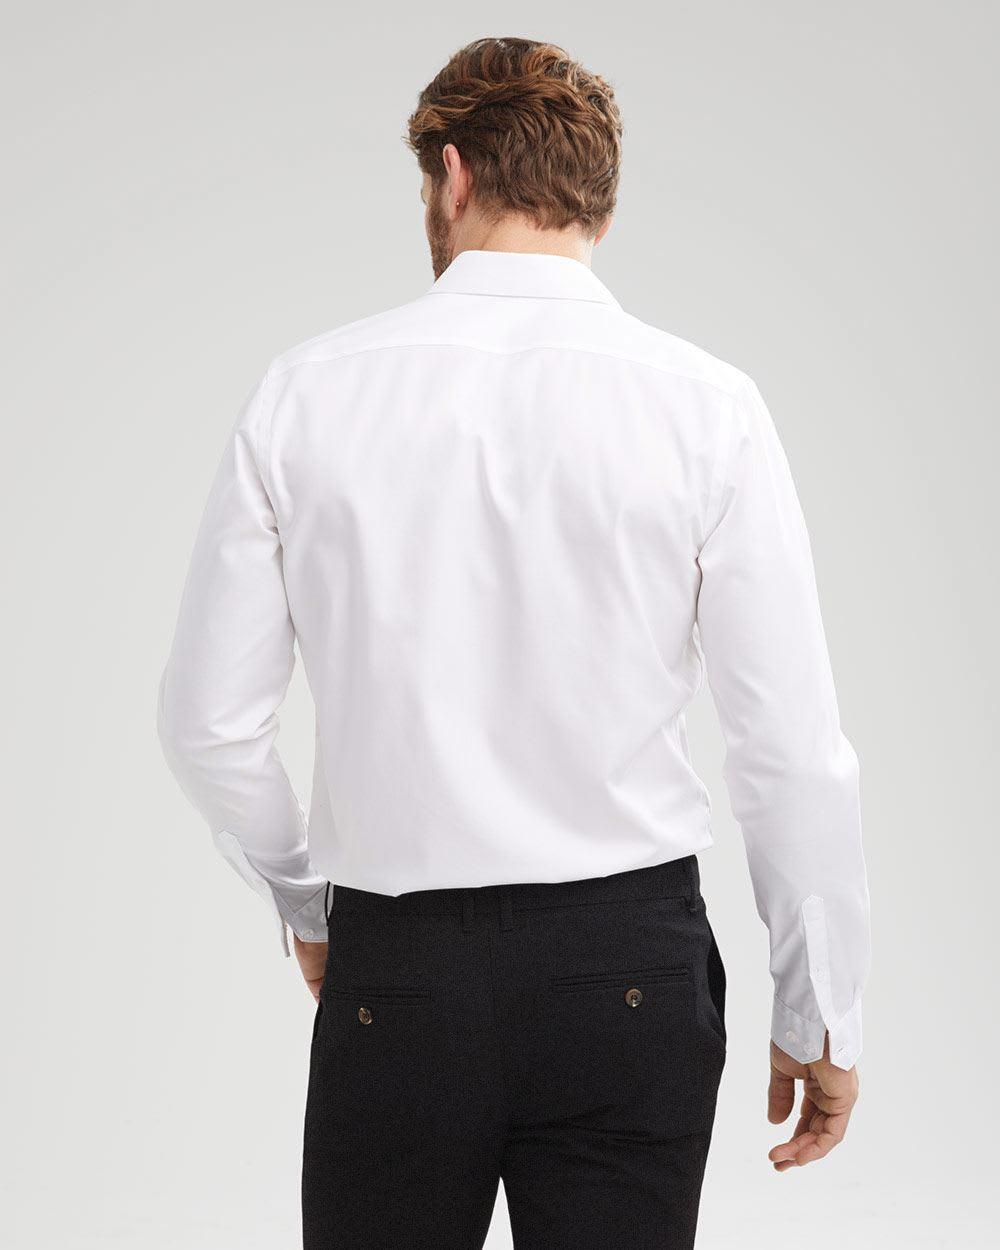 Tailored Fit Solid Dress Shirt Tall Rwco